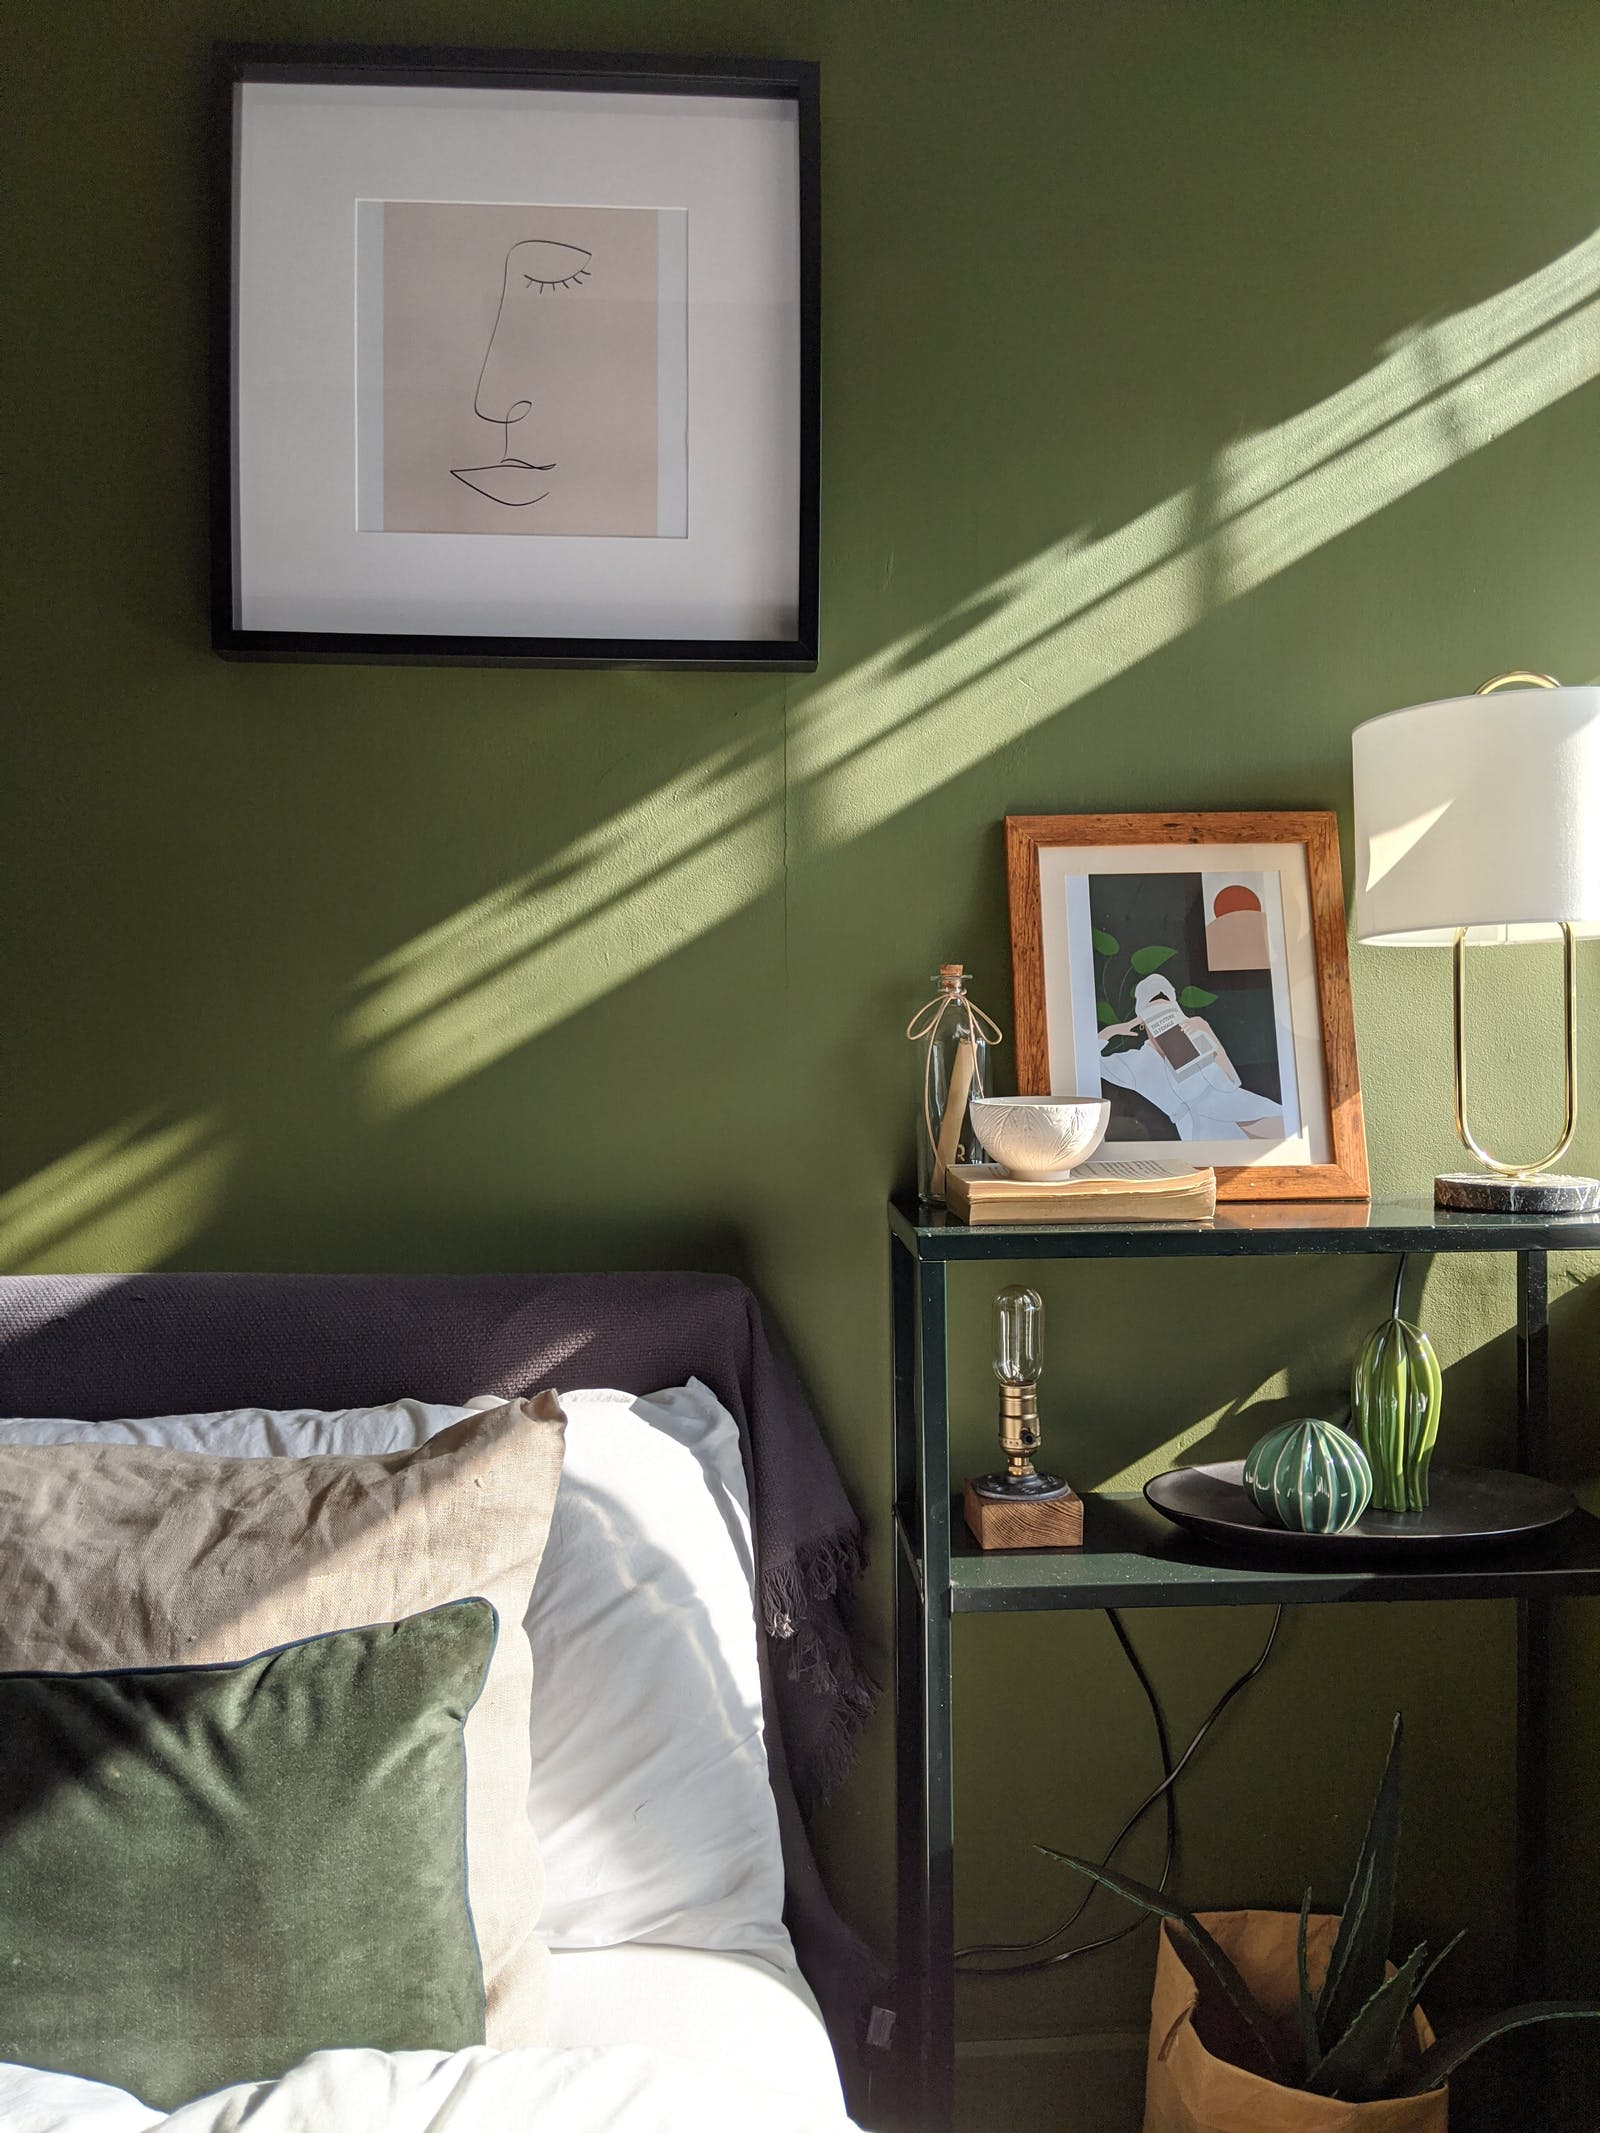 Bedroom painted in Lick Green 05